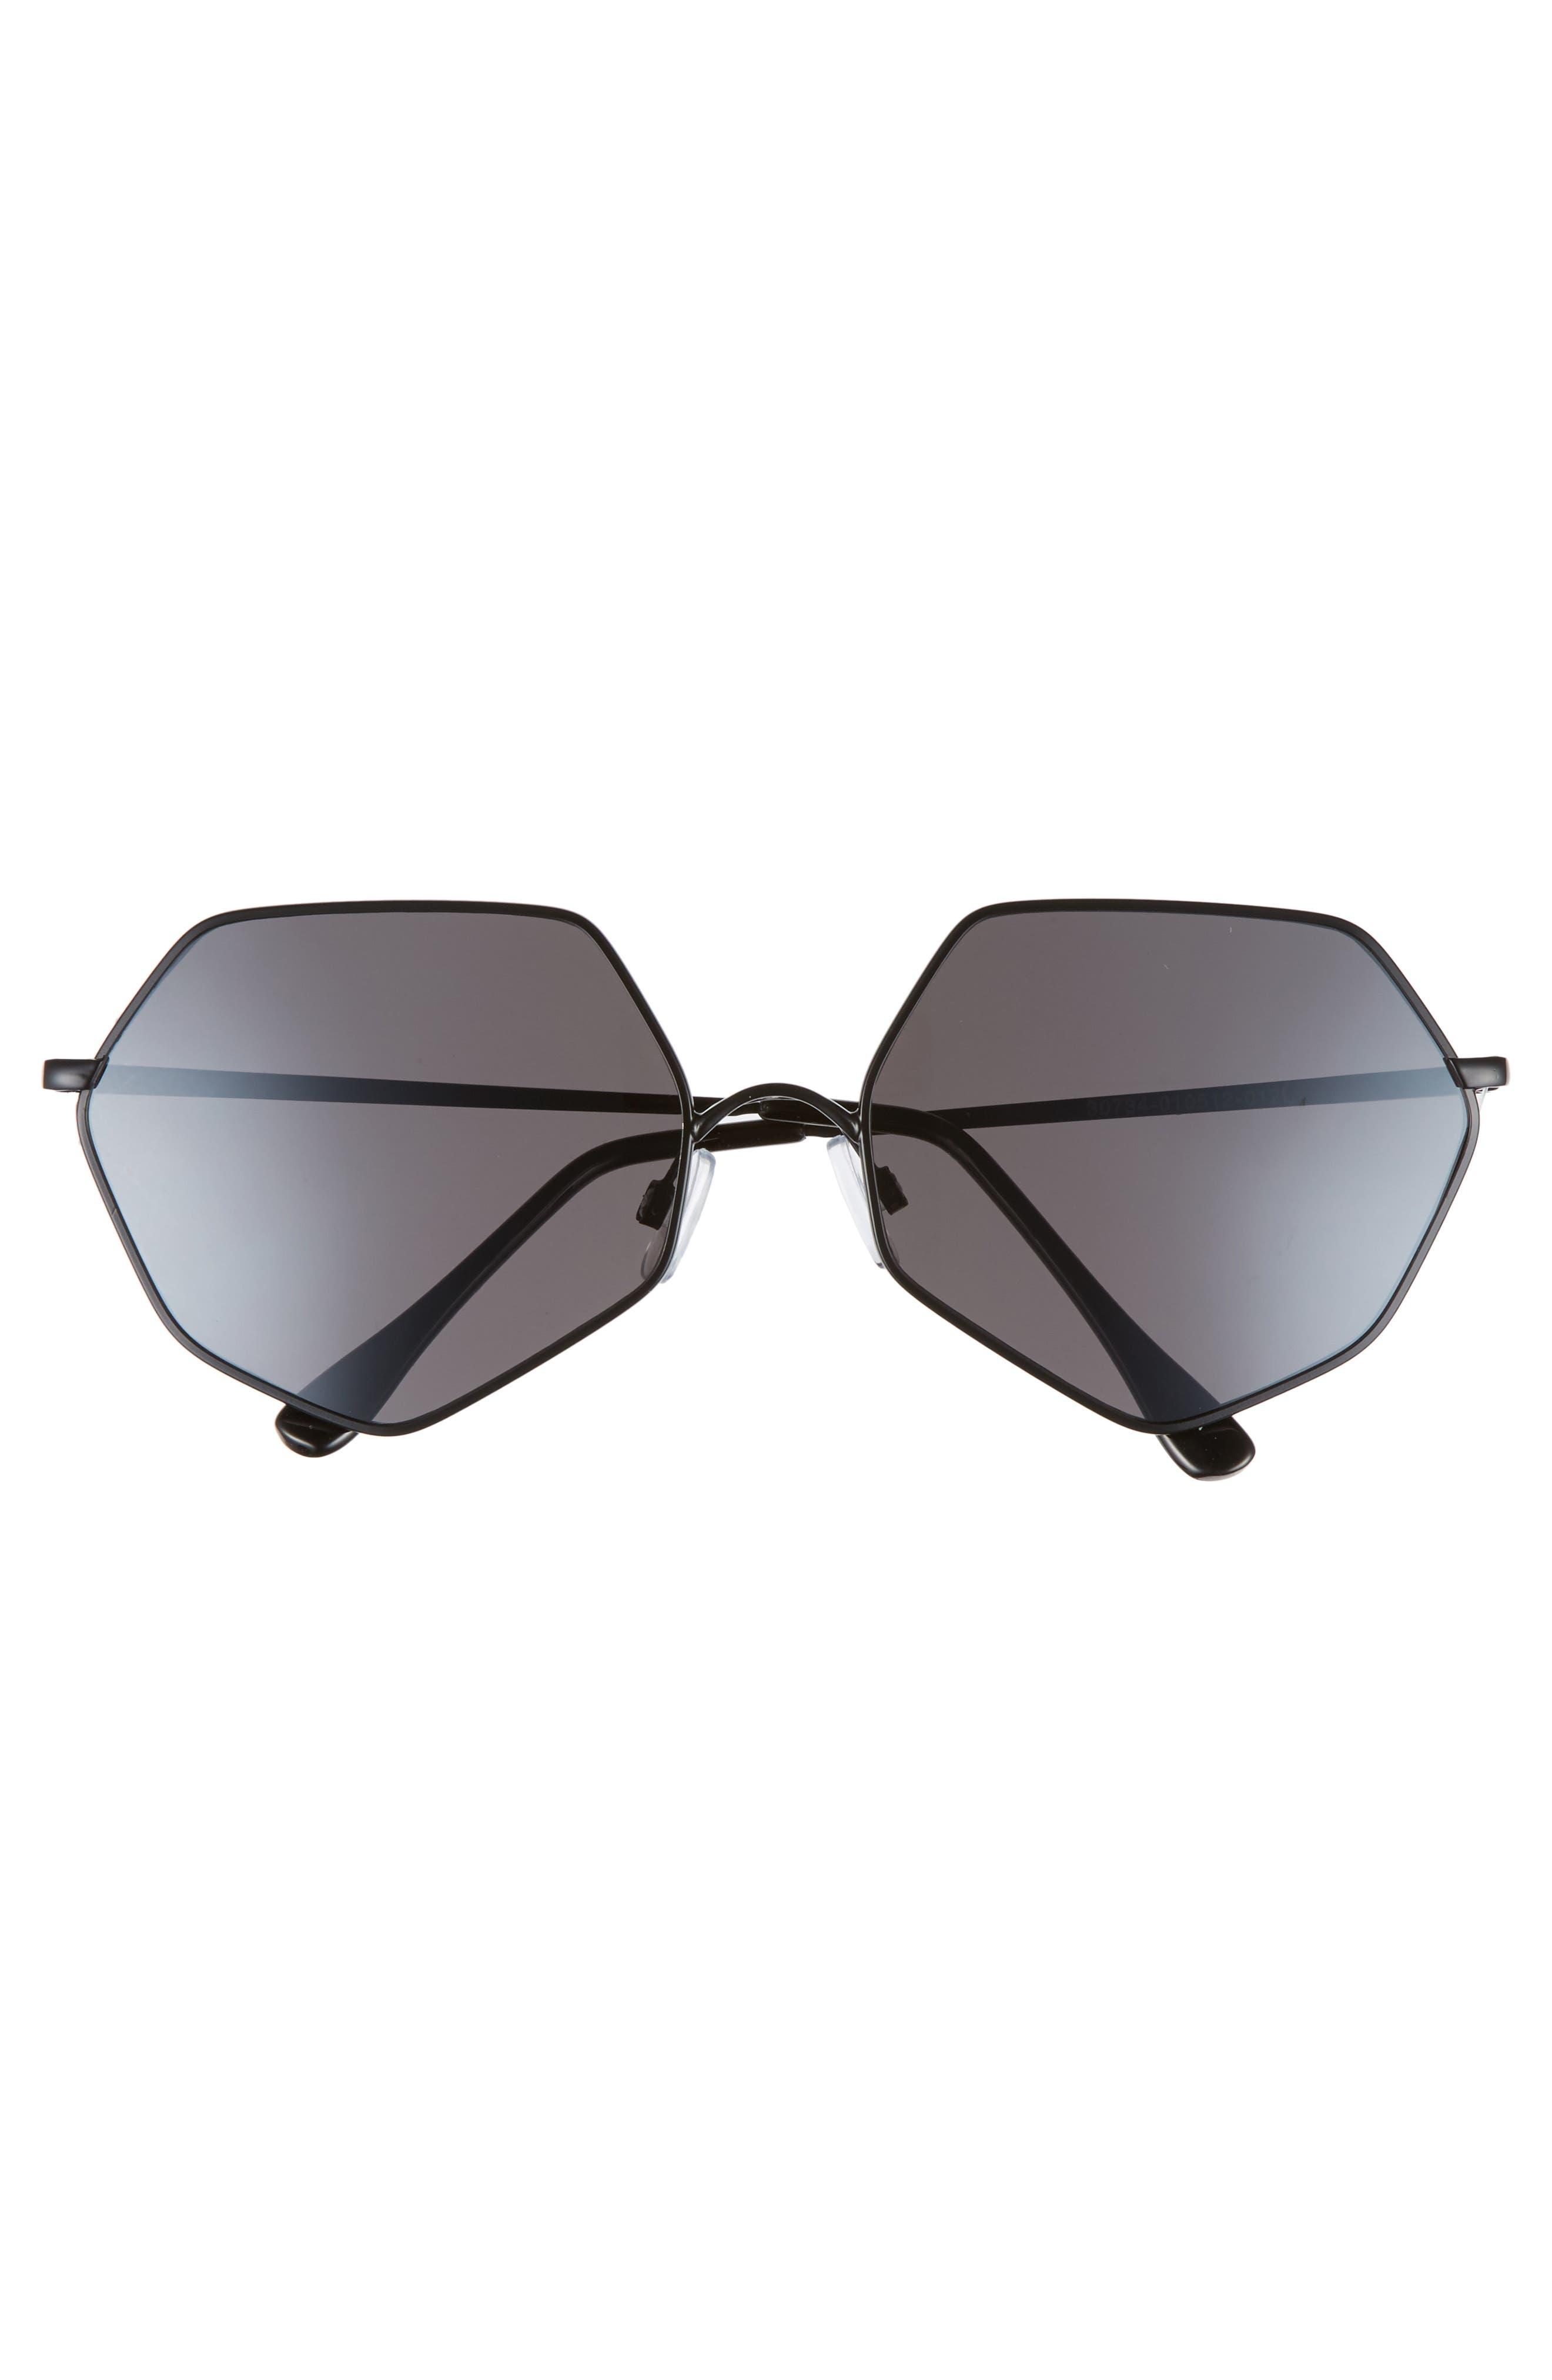 60 mm Geometric Metal Aviator Sunglasses,                             Alternate thumbnail 3, color,                             001